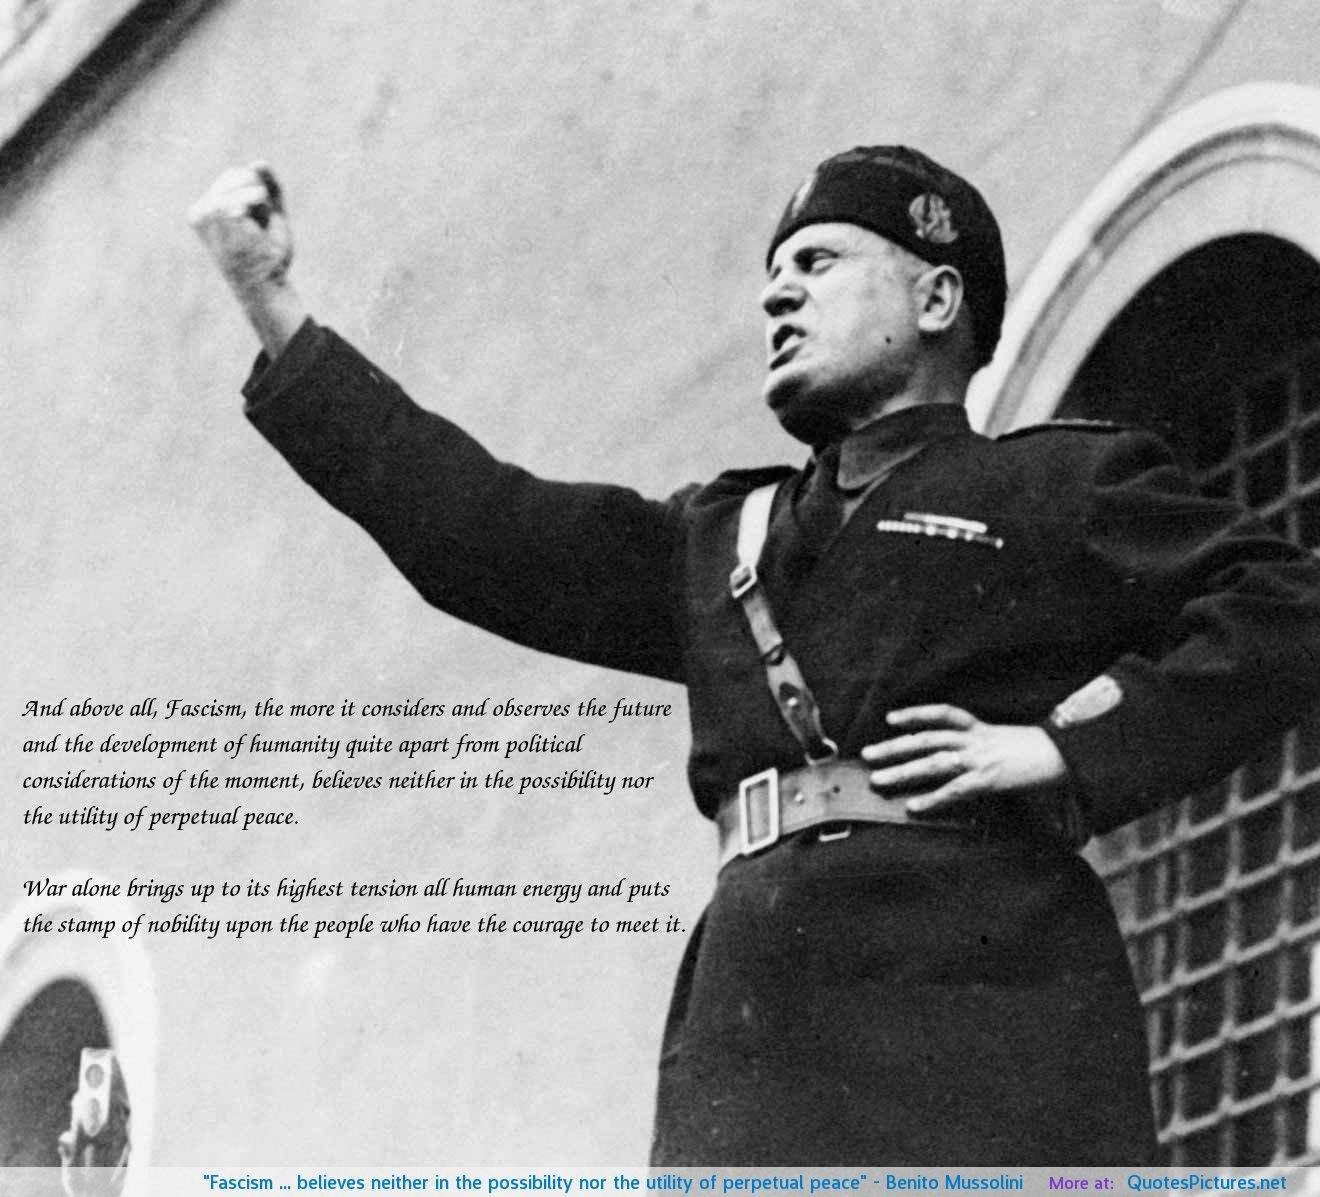 How did Italy's fascist dictator Benito Mussolini die?